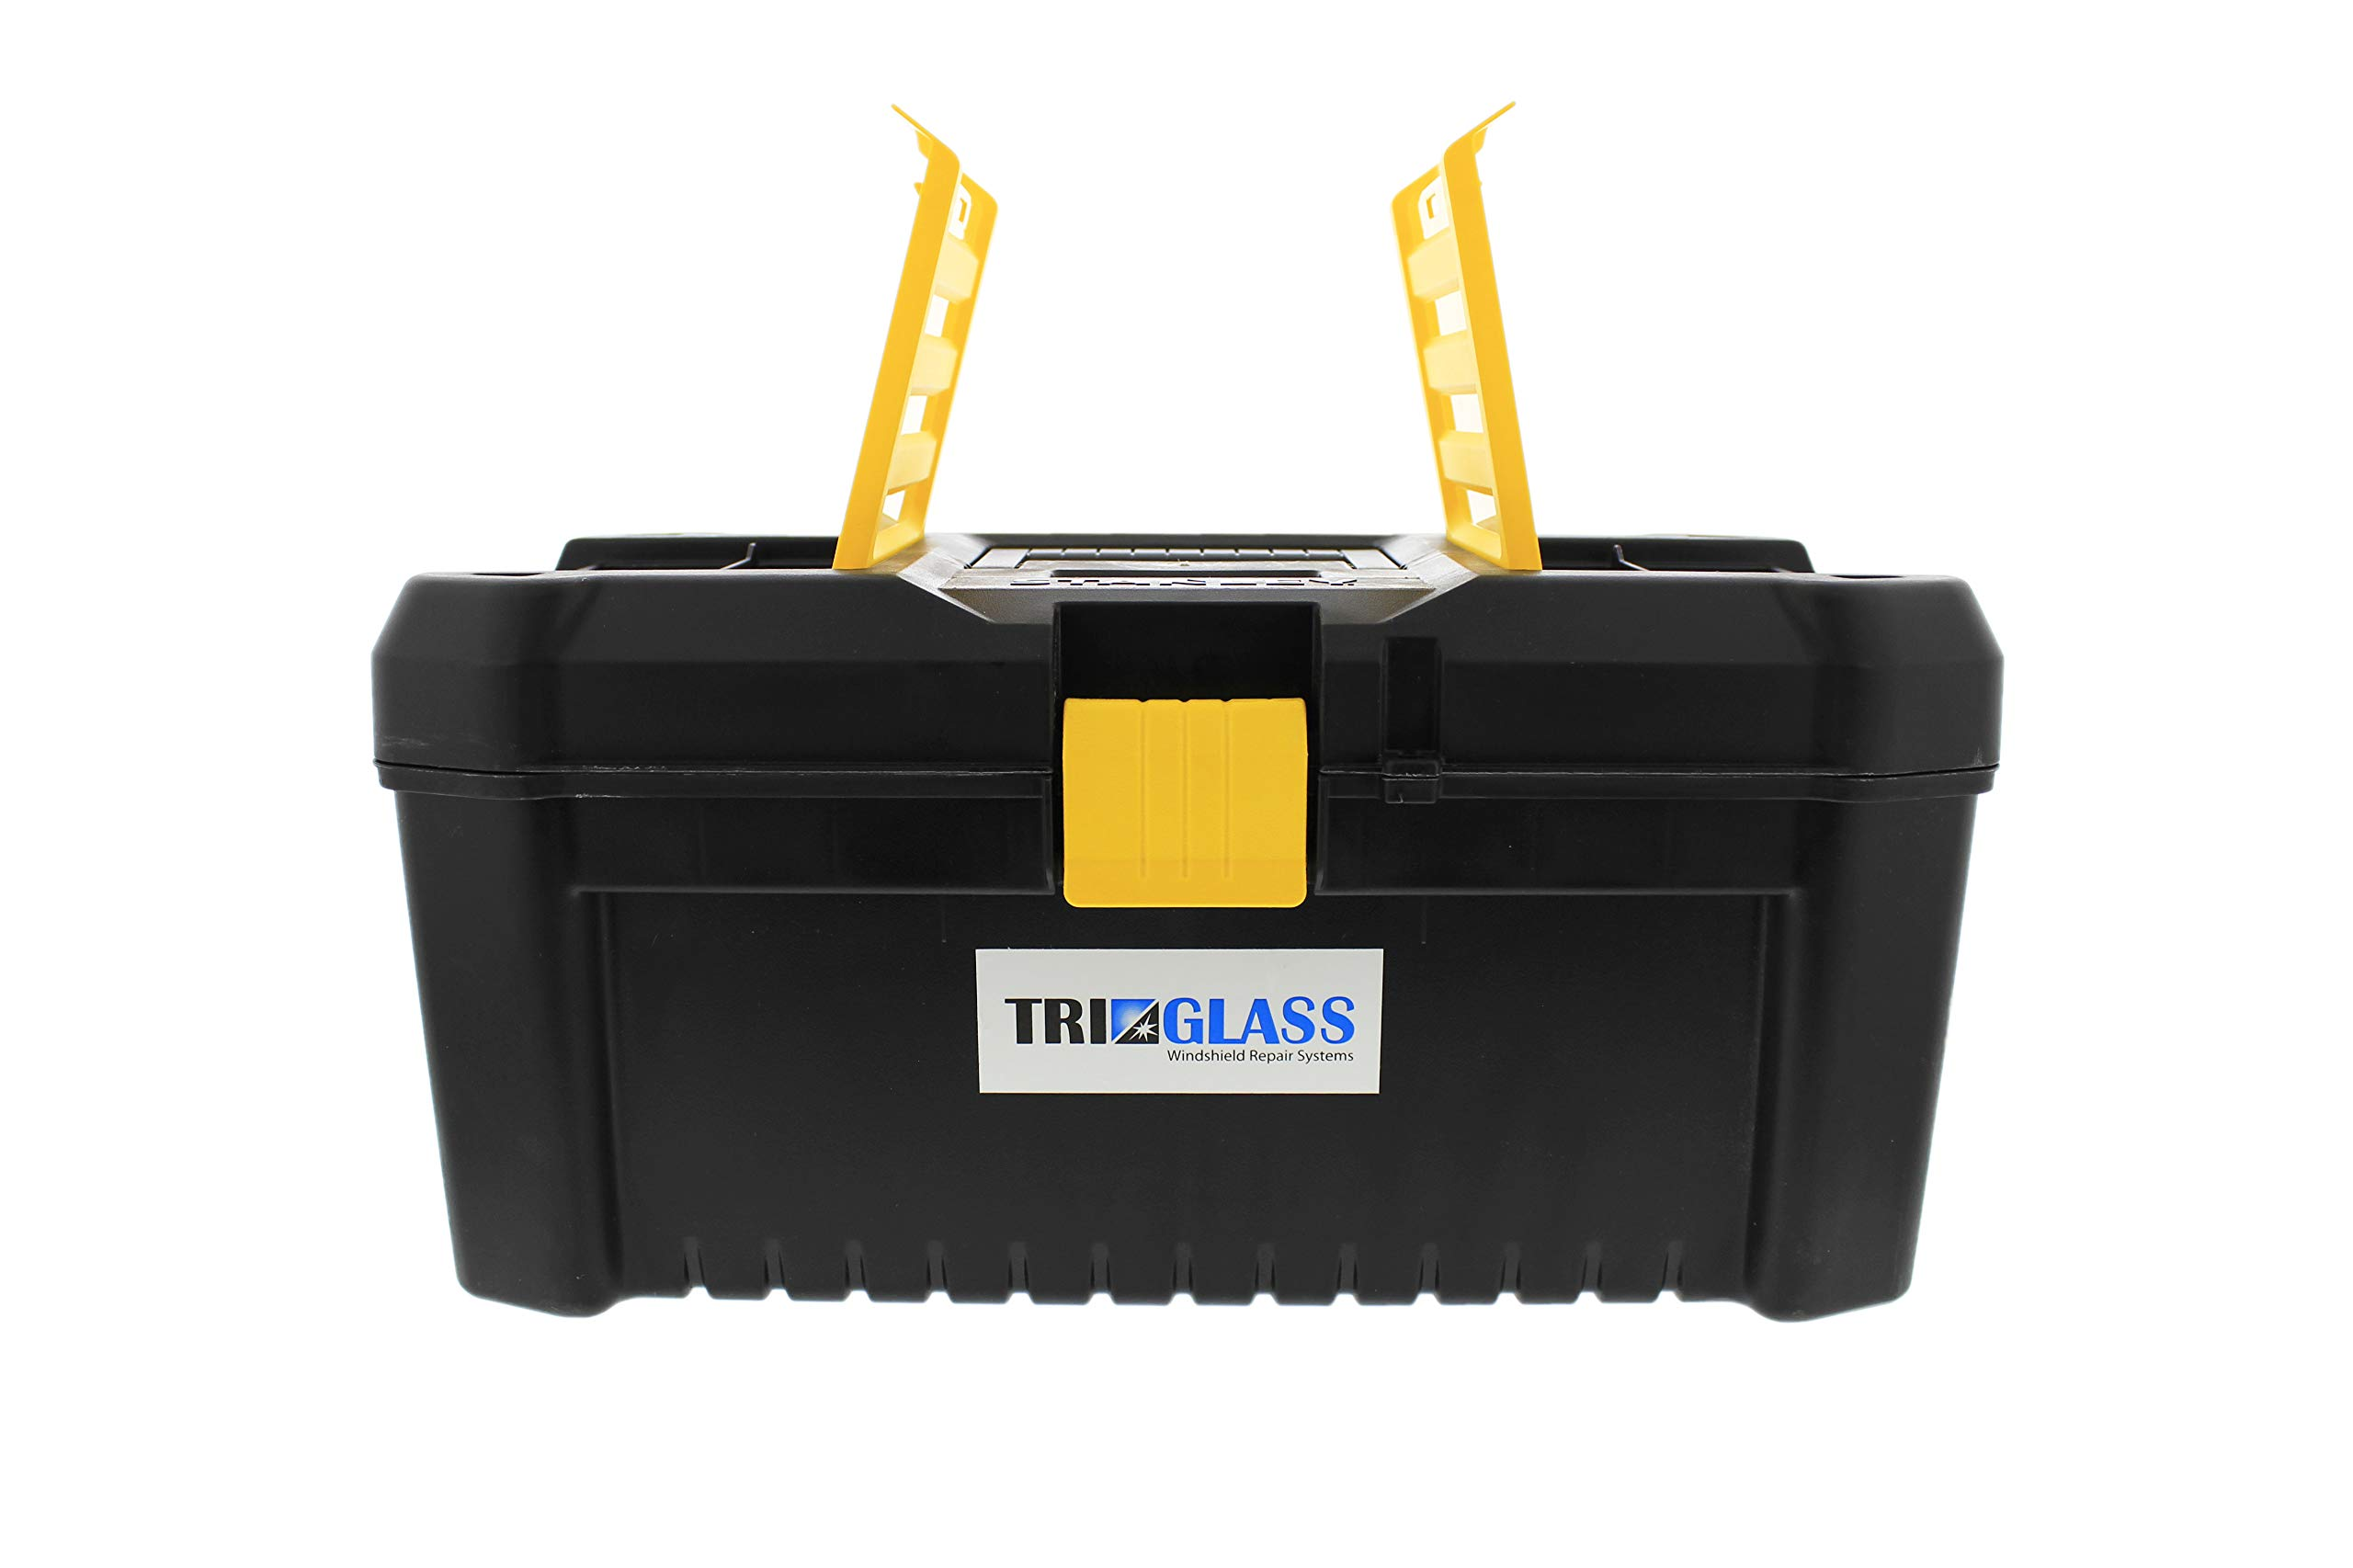 Tri Glass Quality Windshield Repair Kits (Tri Glass TRI 15 Essential Windshield Repair Kit) by Tri Glass (Image #3)